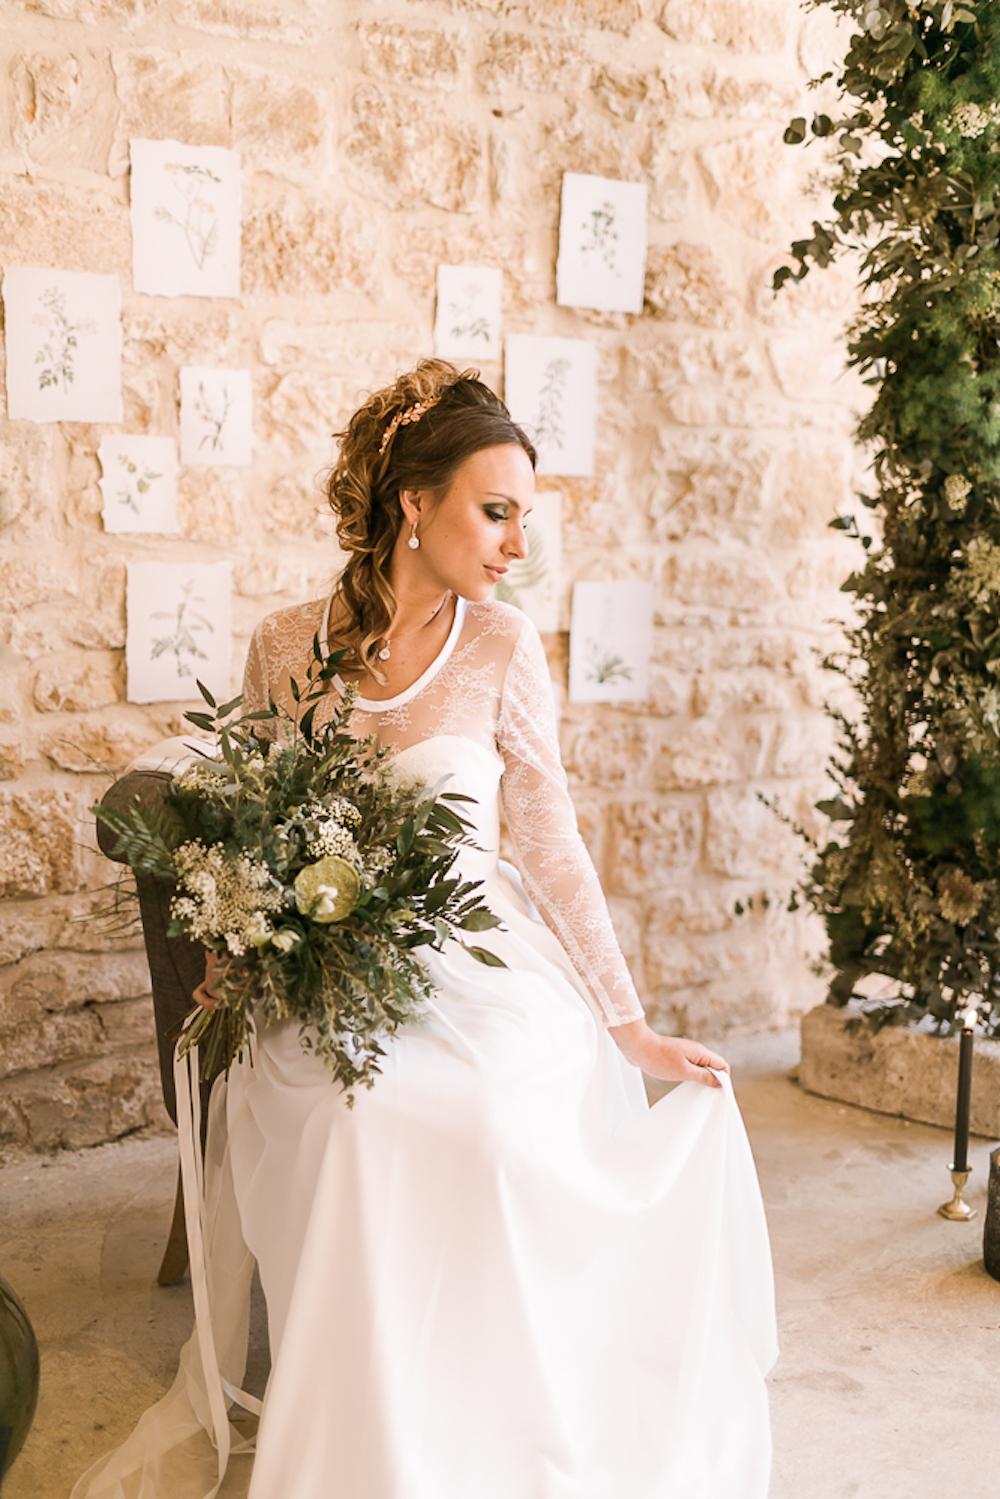 parisian-inspired-blog-mariage-shooting-inspiration-vegetal-abbaye-trois-fontaines-marne-cg-photographie-7.jpg